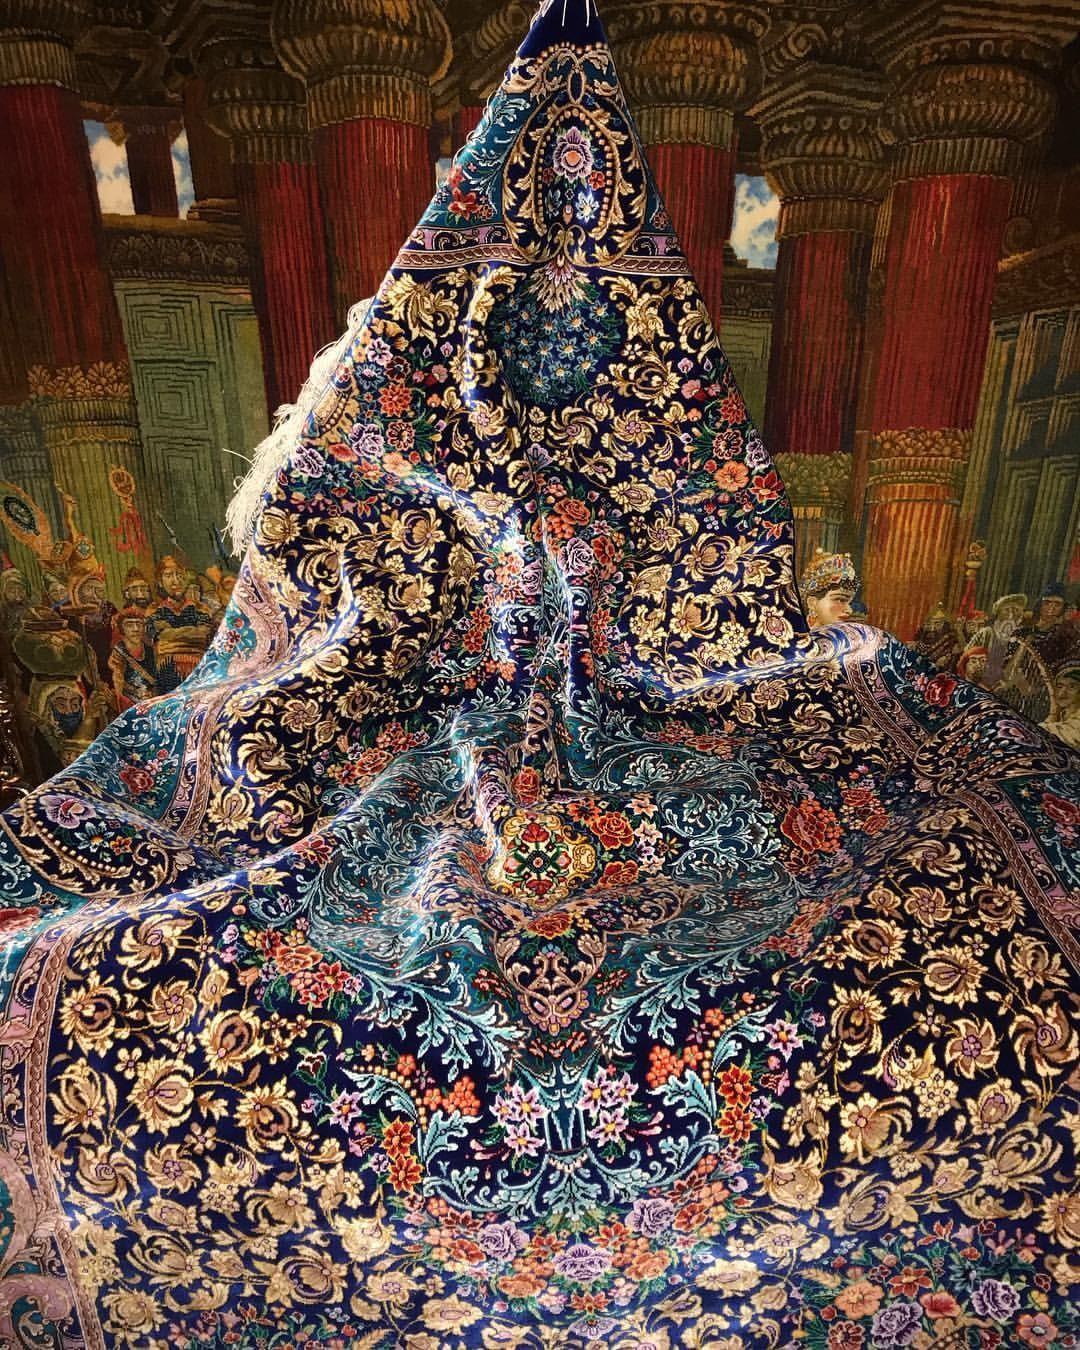 Iranian Silk Carpet Art هنر نمائى فرش ابريشم ايران Iranian Art Carpet Iranian Irania Iranian Carpet Silk Carpet Rugs On Carpet